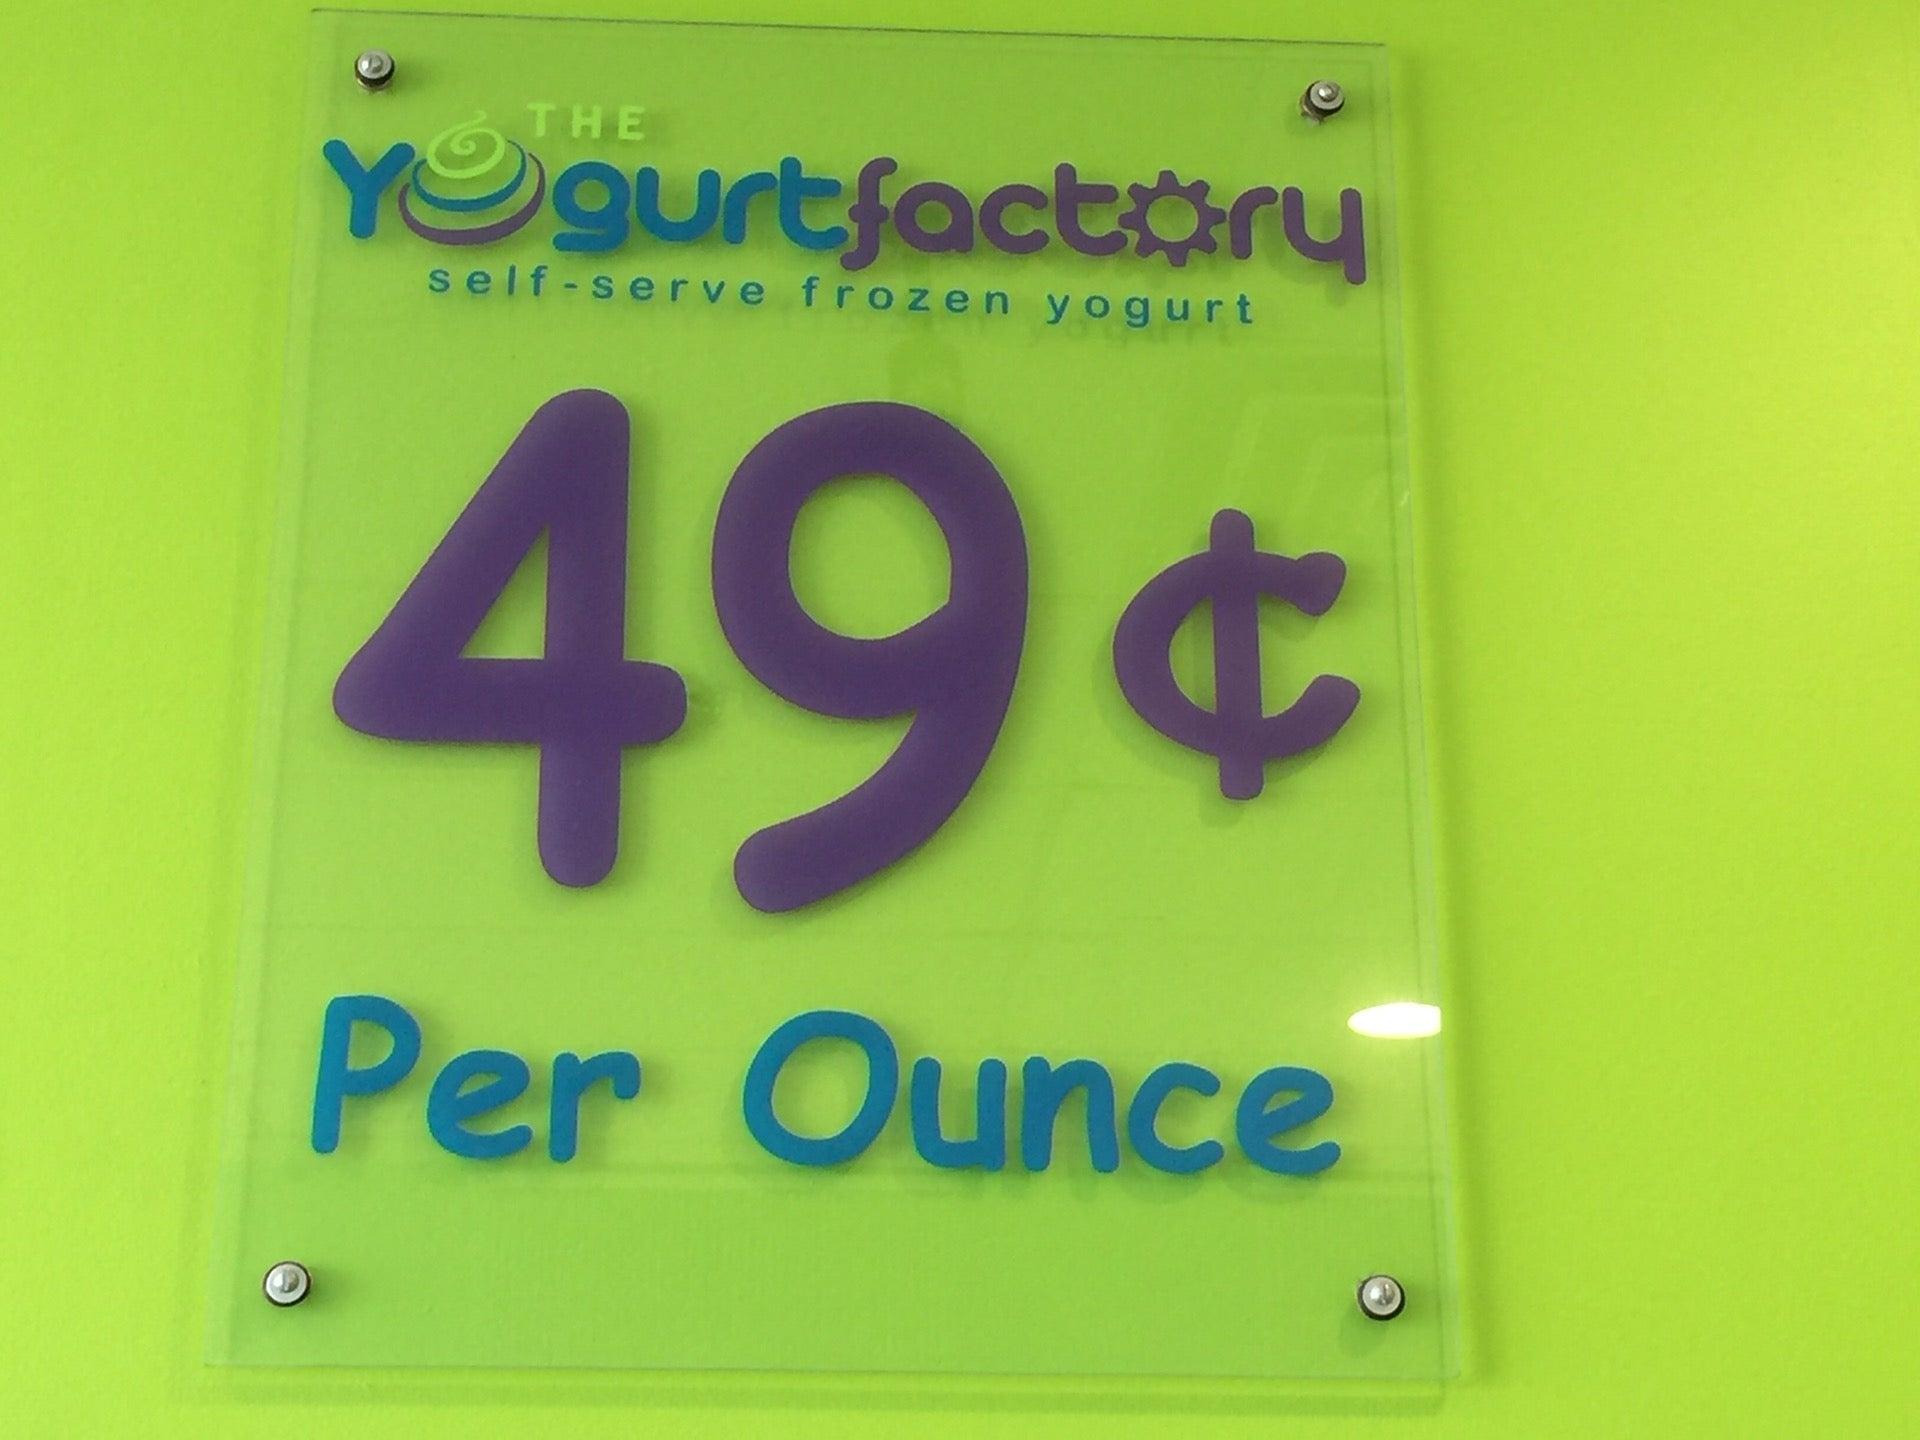 The Yogurt Factory,